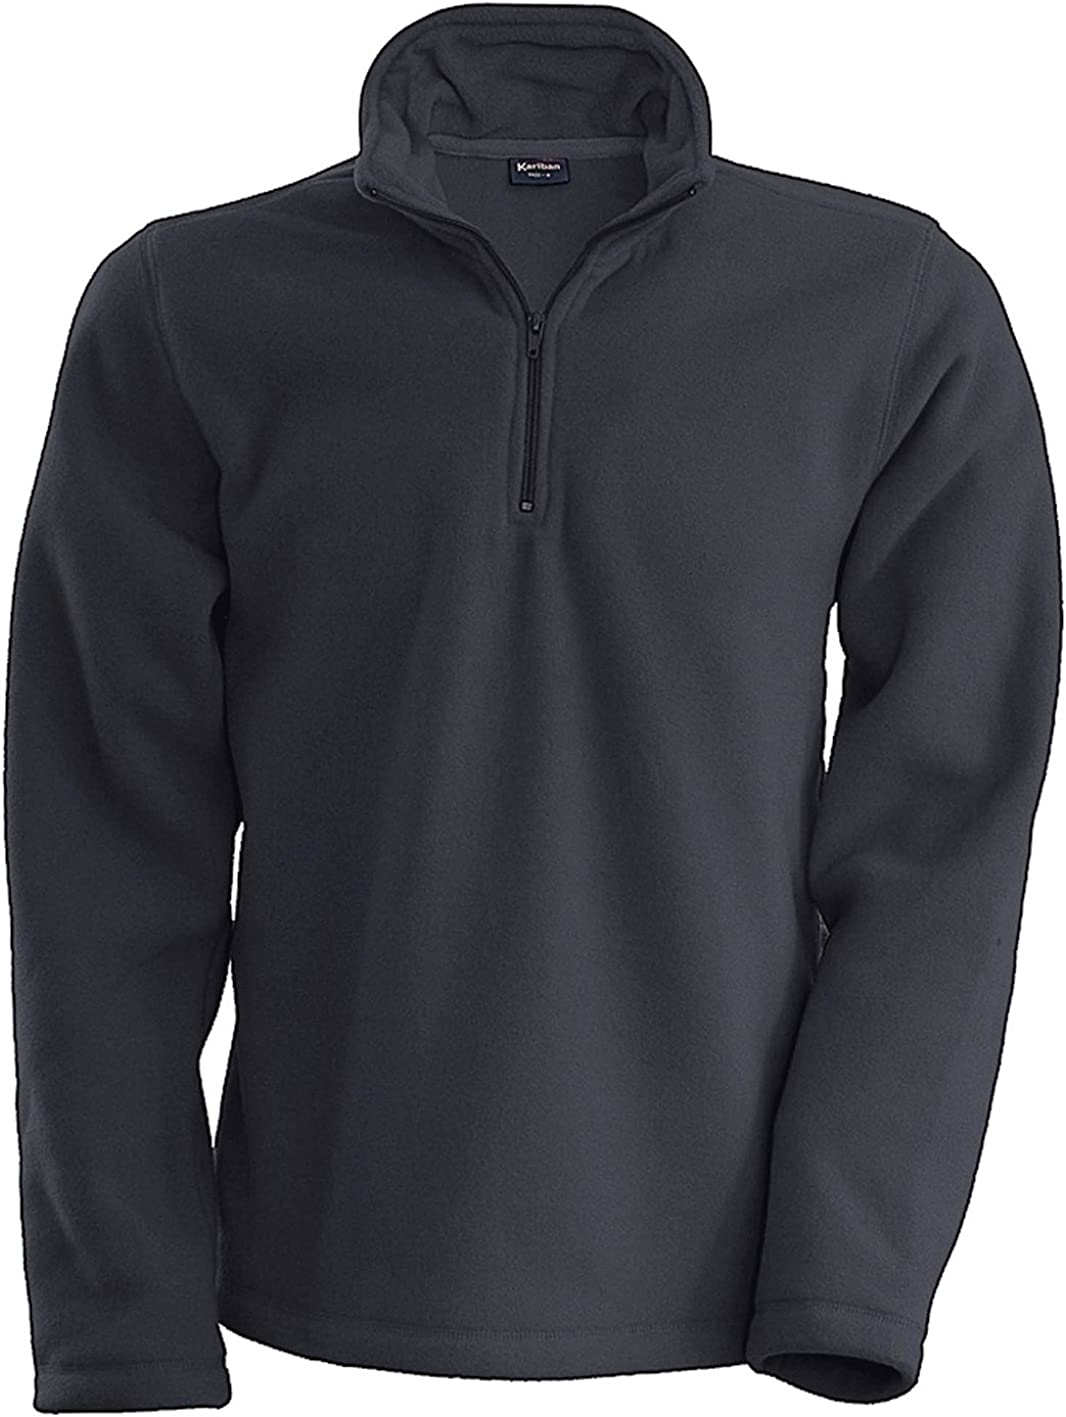 Kariban Mens Enzo 1//4 Zip Up Casual Fleece Jackets